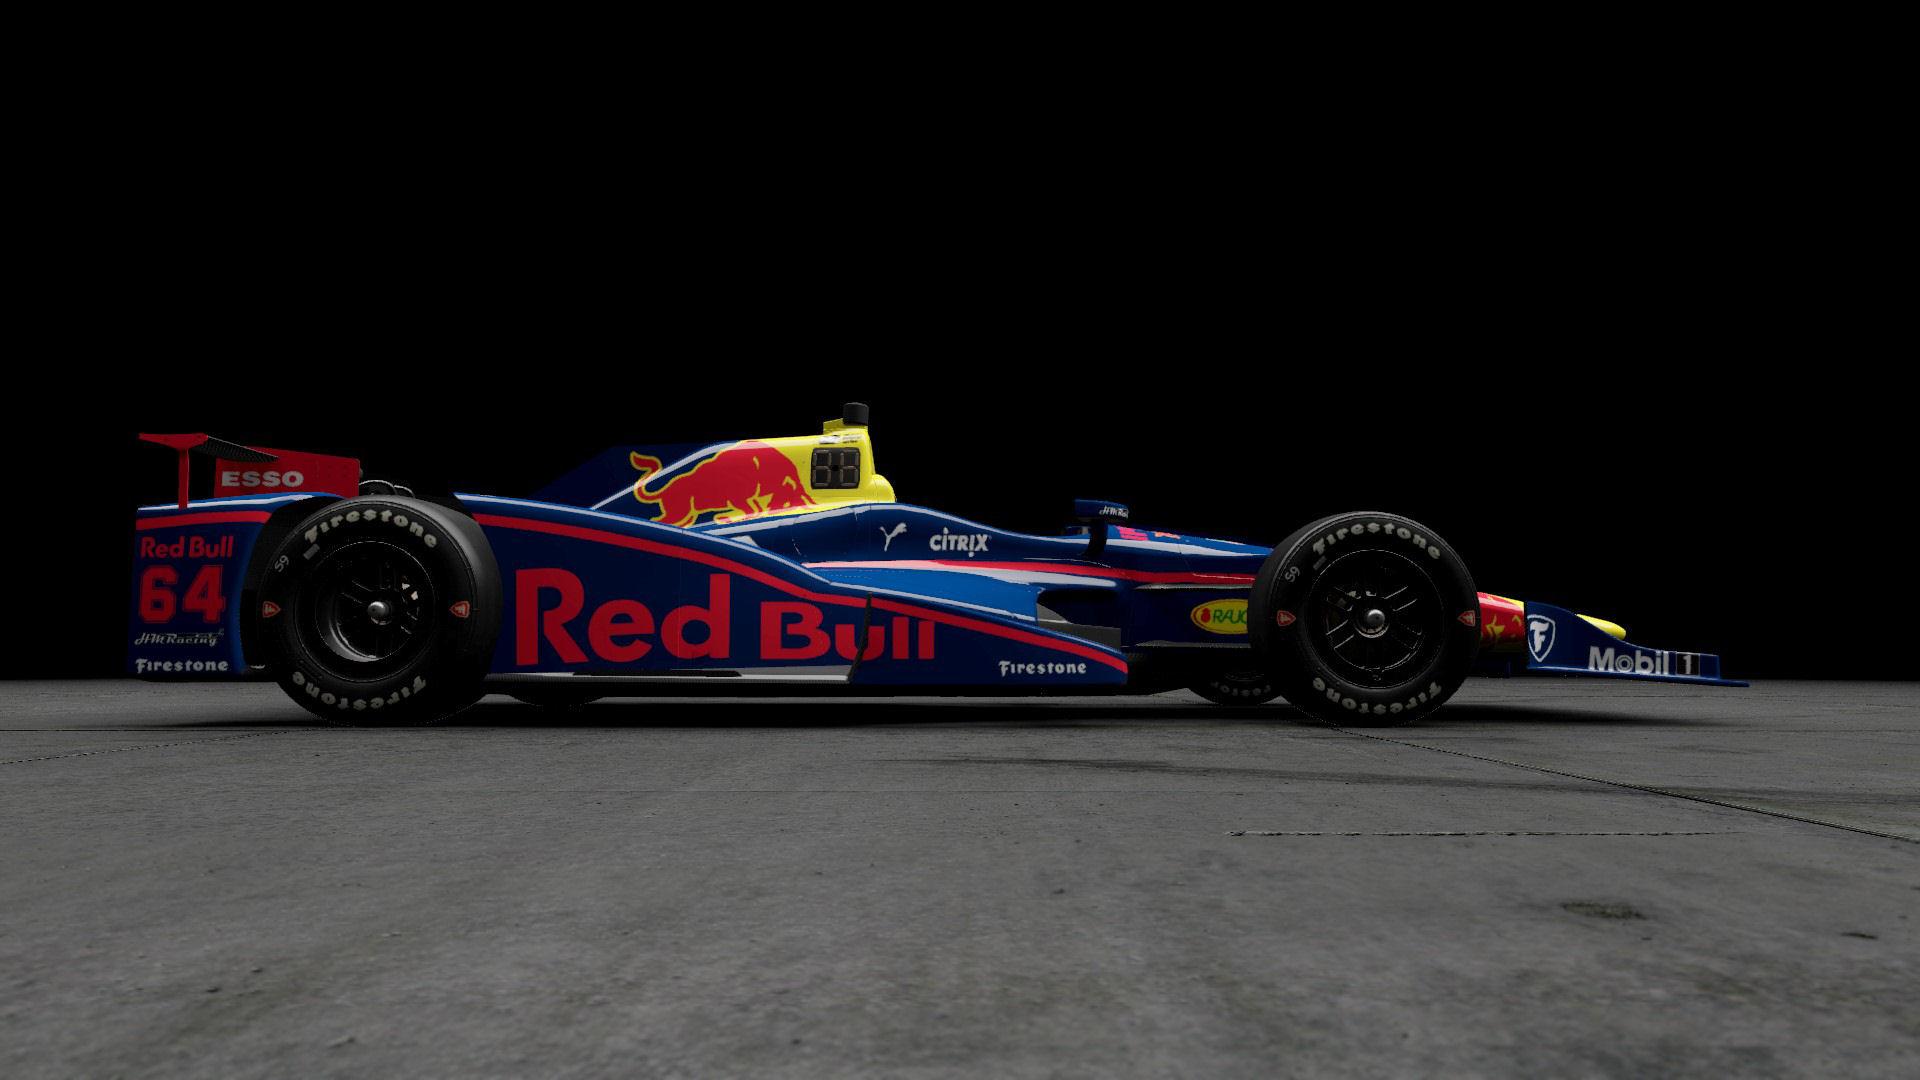 Red Bull dallara dw12 Honda oval 02.jpg